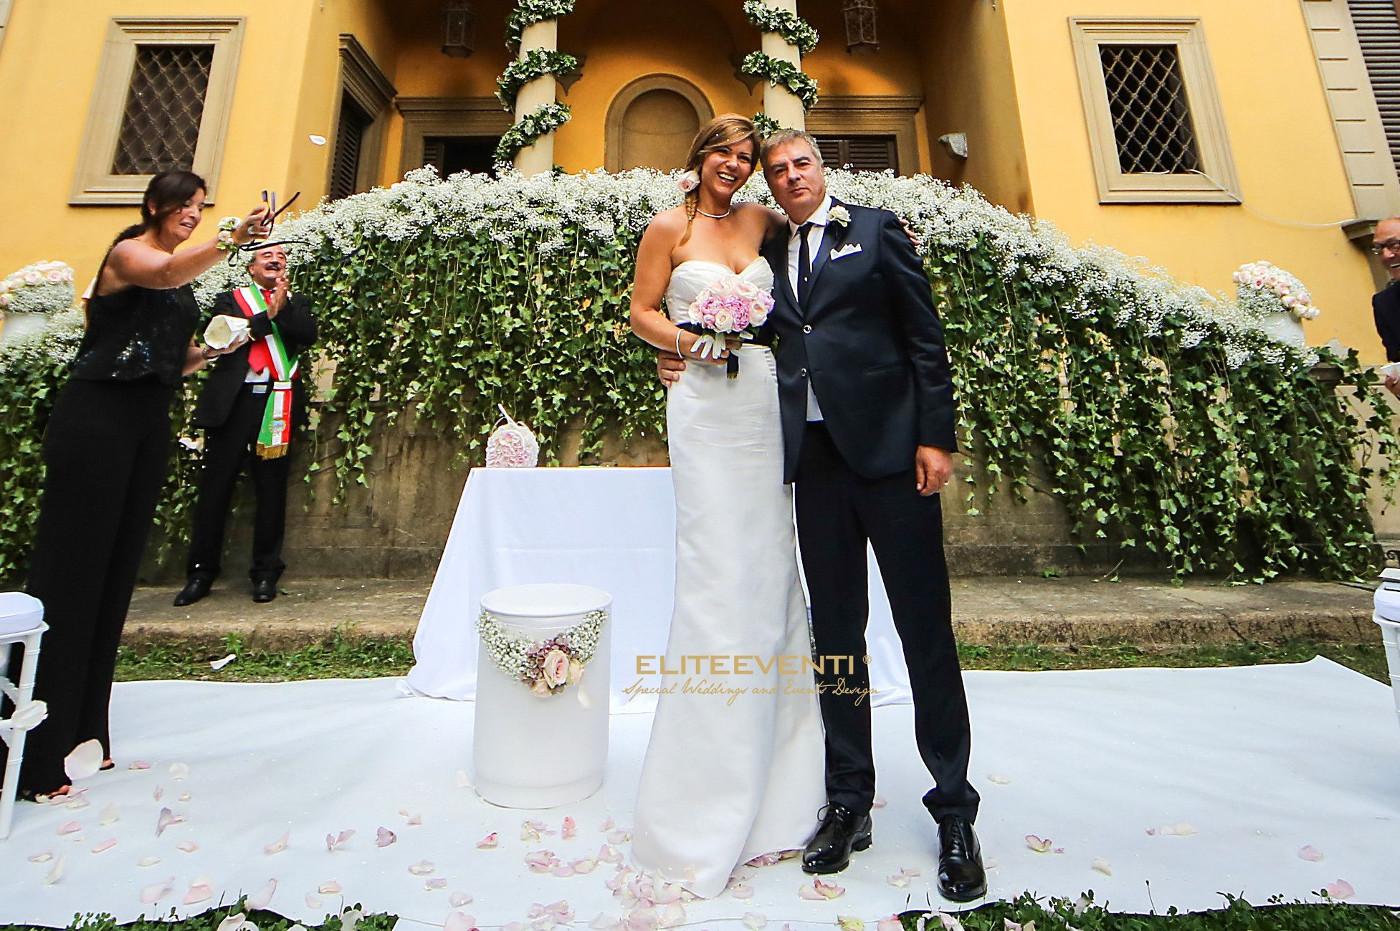 Alba E Stefano - Tuscany Dream Wedding by Eliteeventi